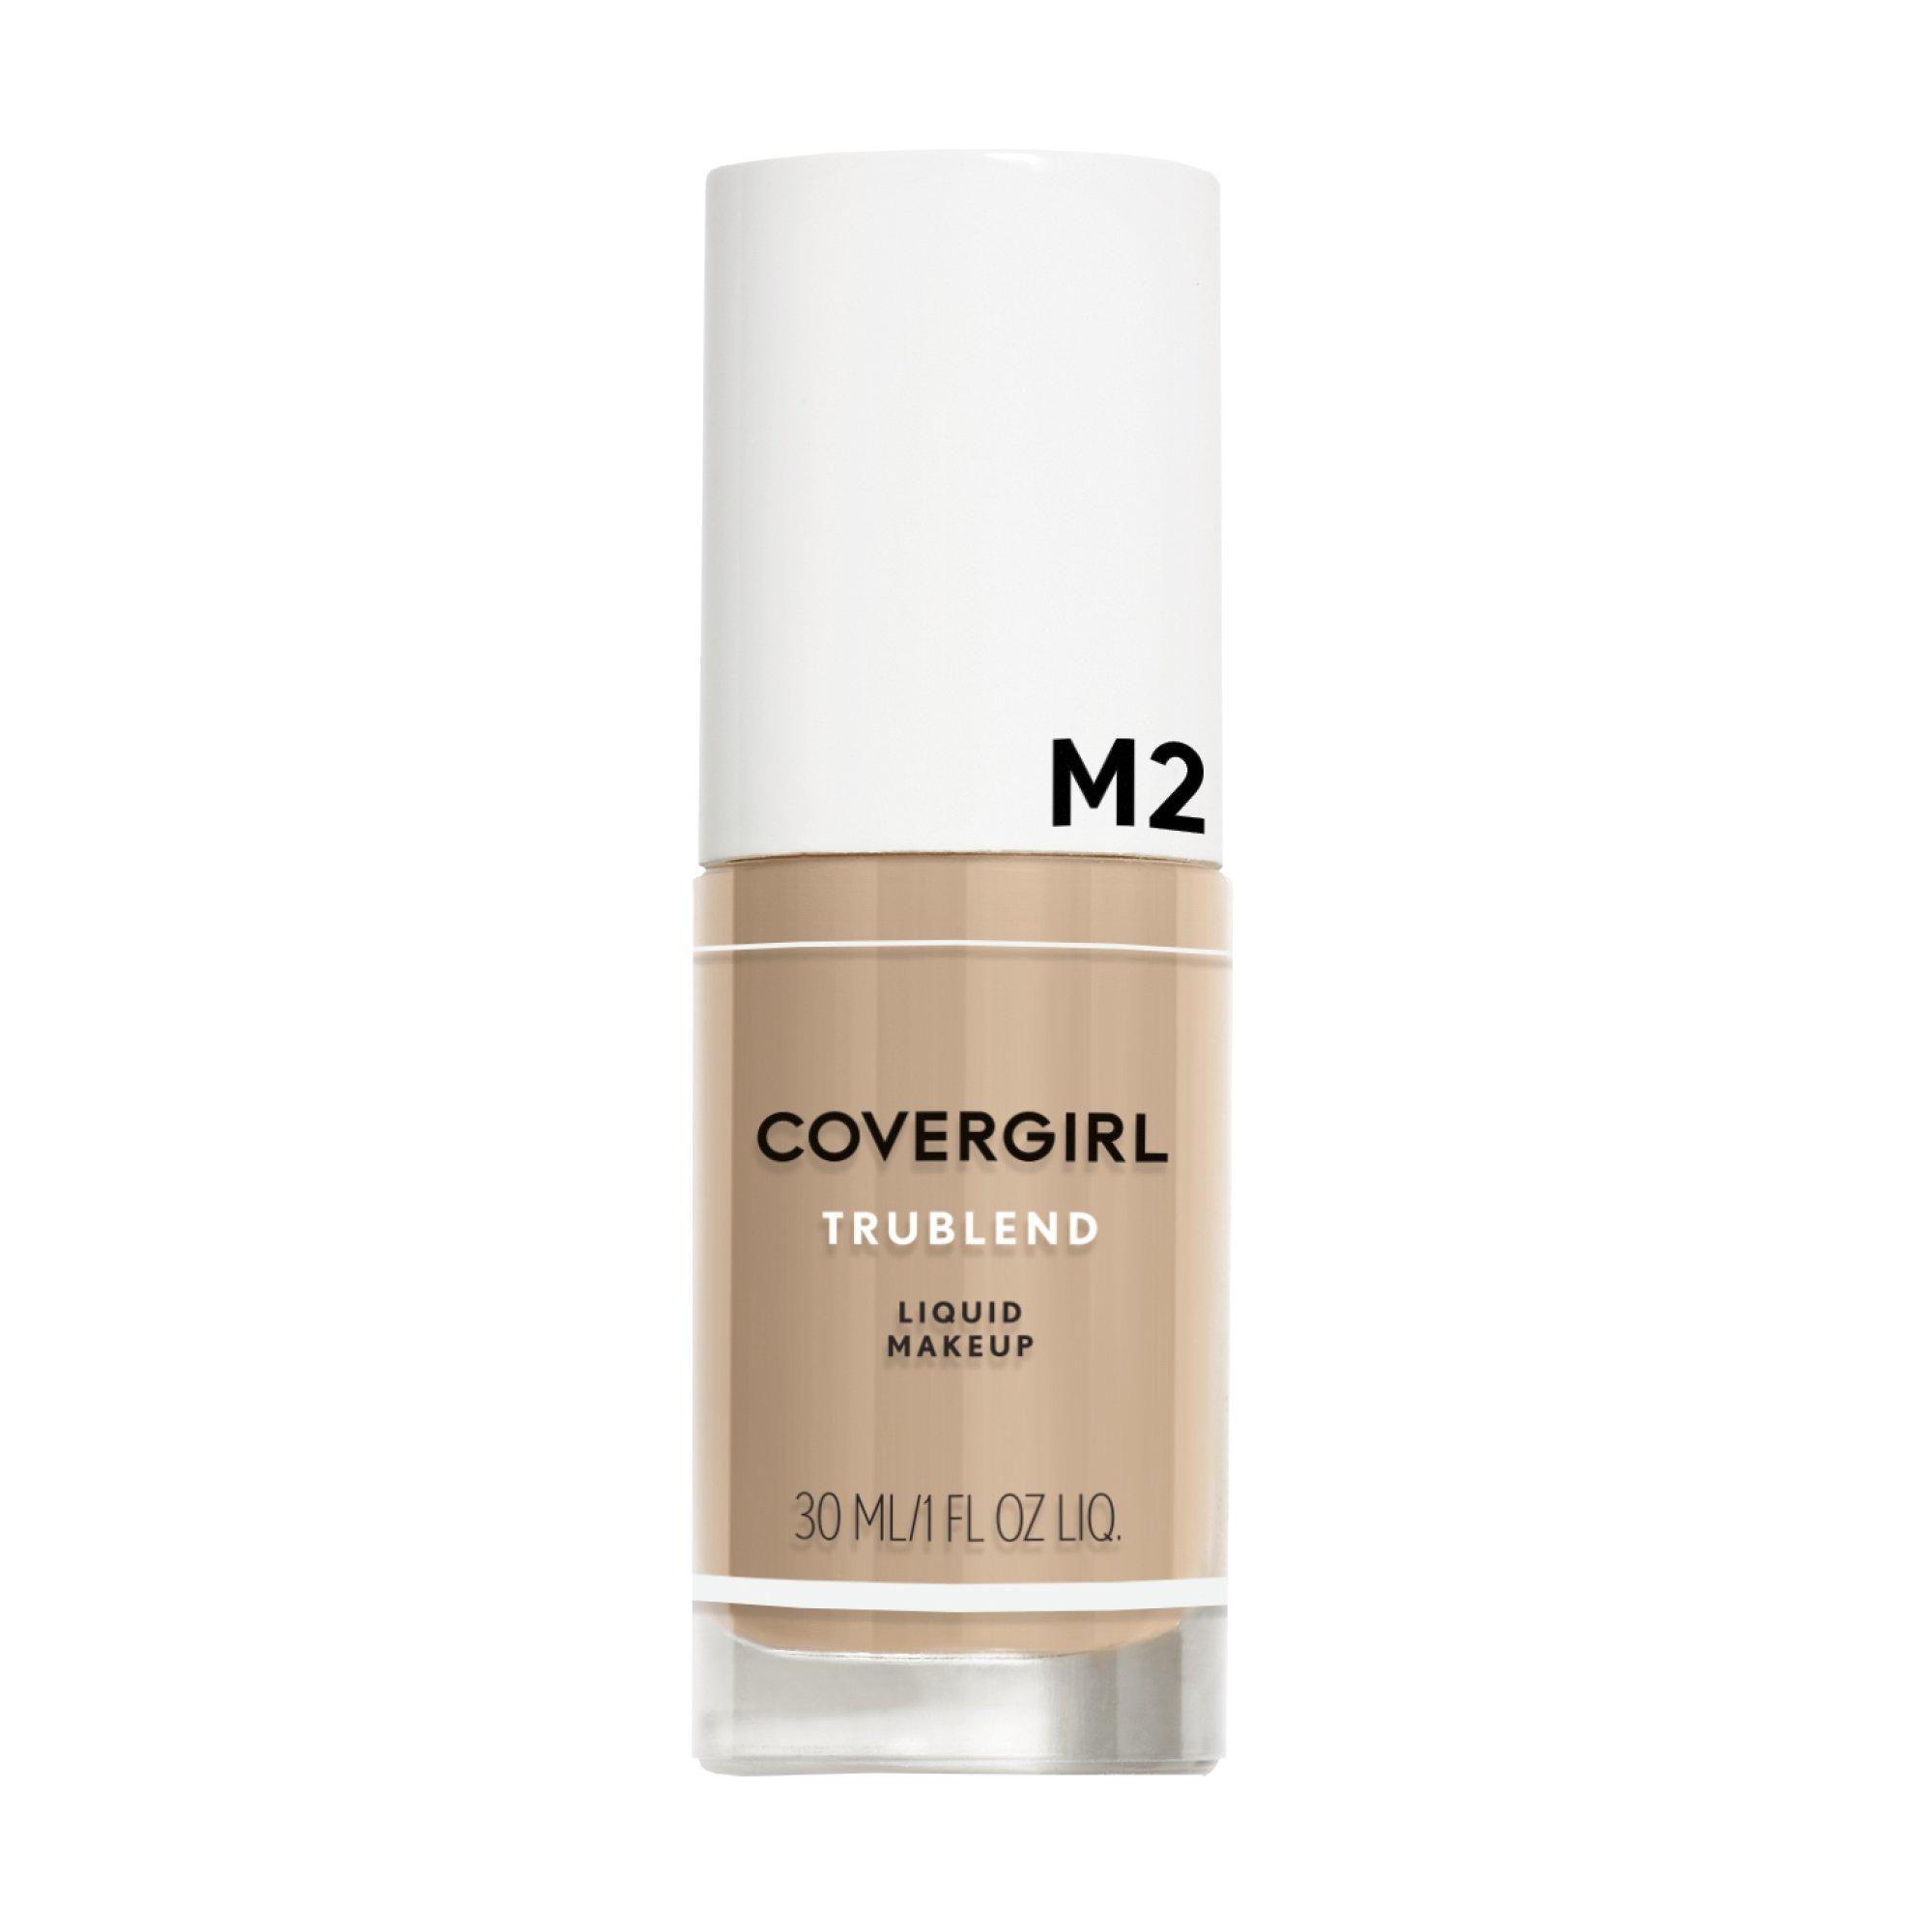 COVERGIRL truBlend Liquid Foundation Makeup Medium Light M2, 1 oz (packaging may vary)